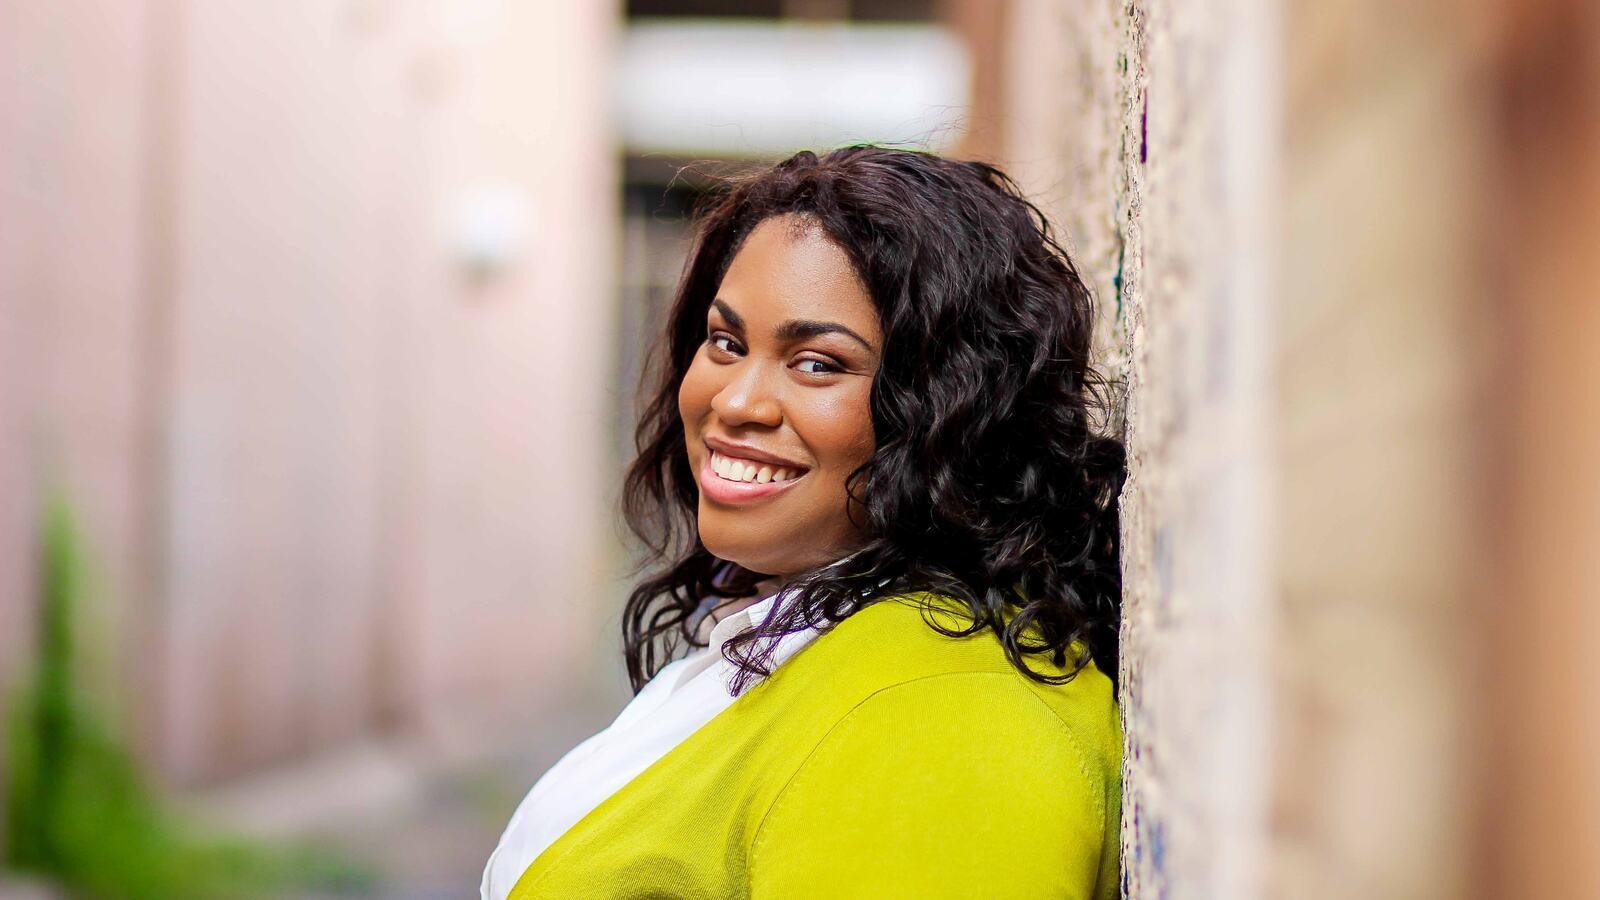 Angie Thomas, author